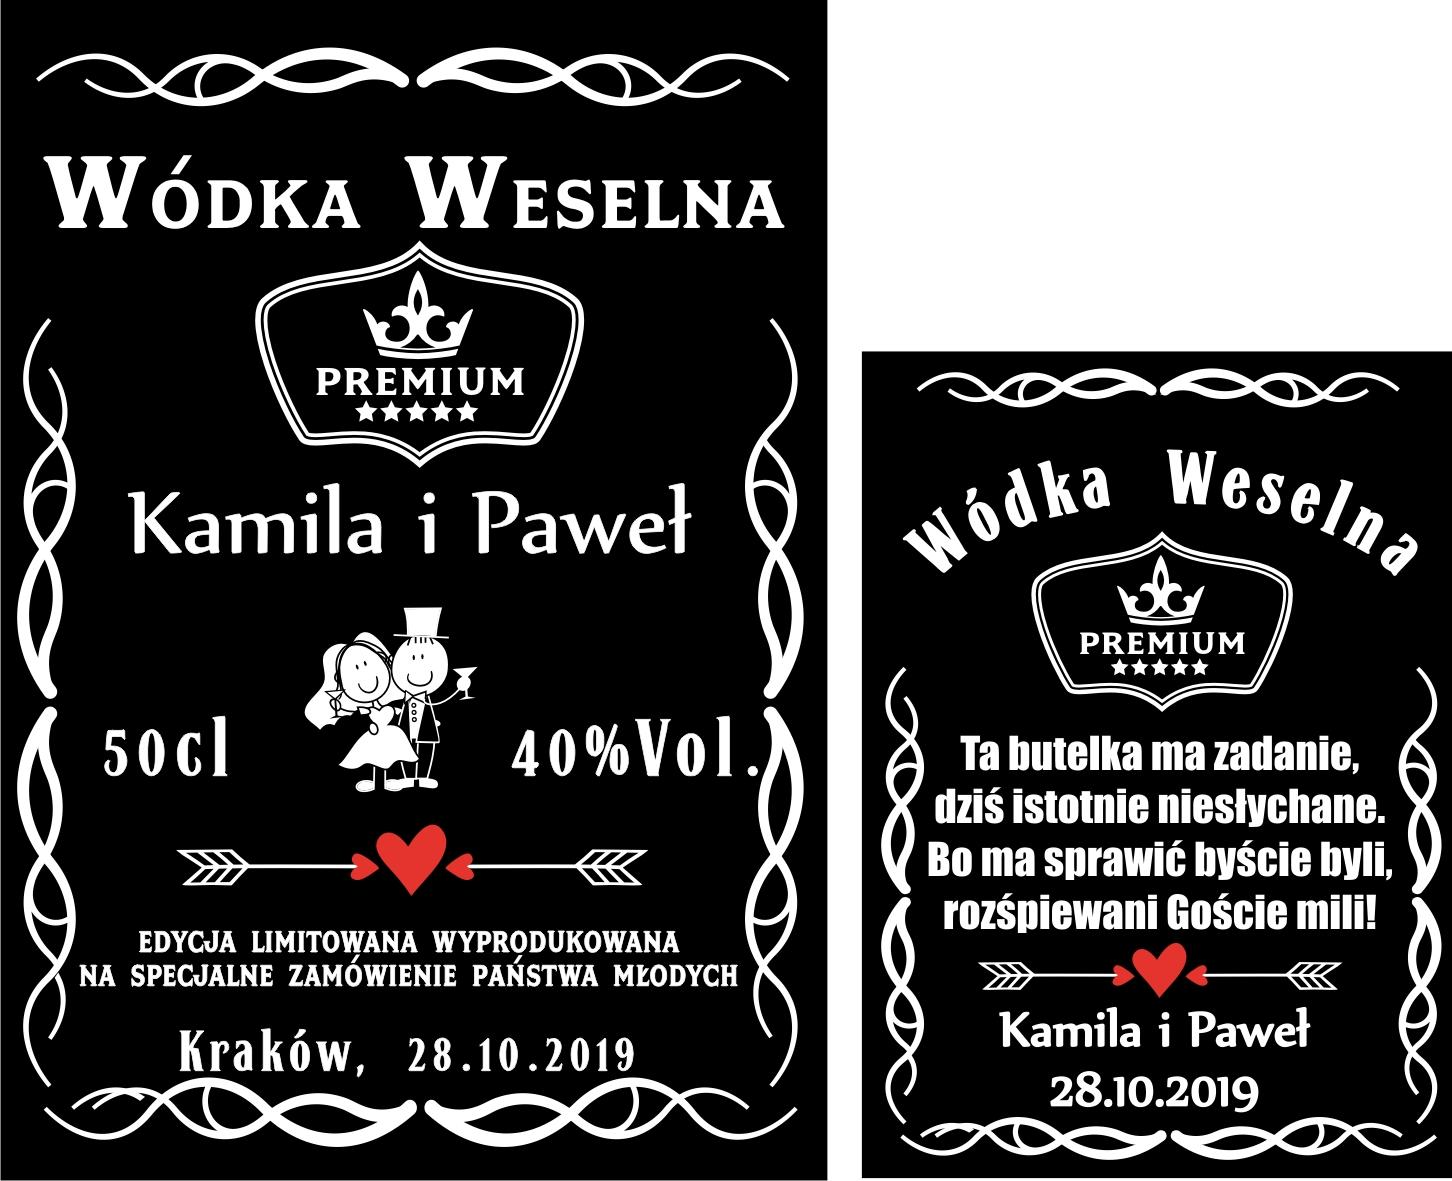 Etykiety Naklejki Wodke Weselna Alkohol Bimber Komplet